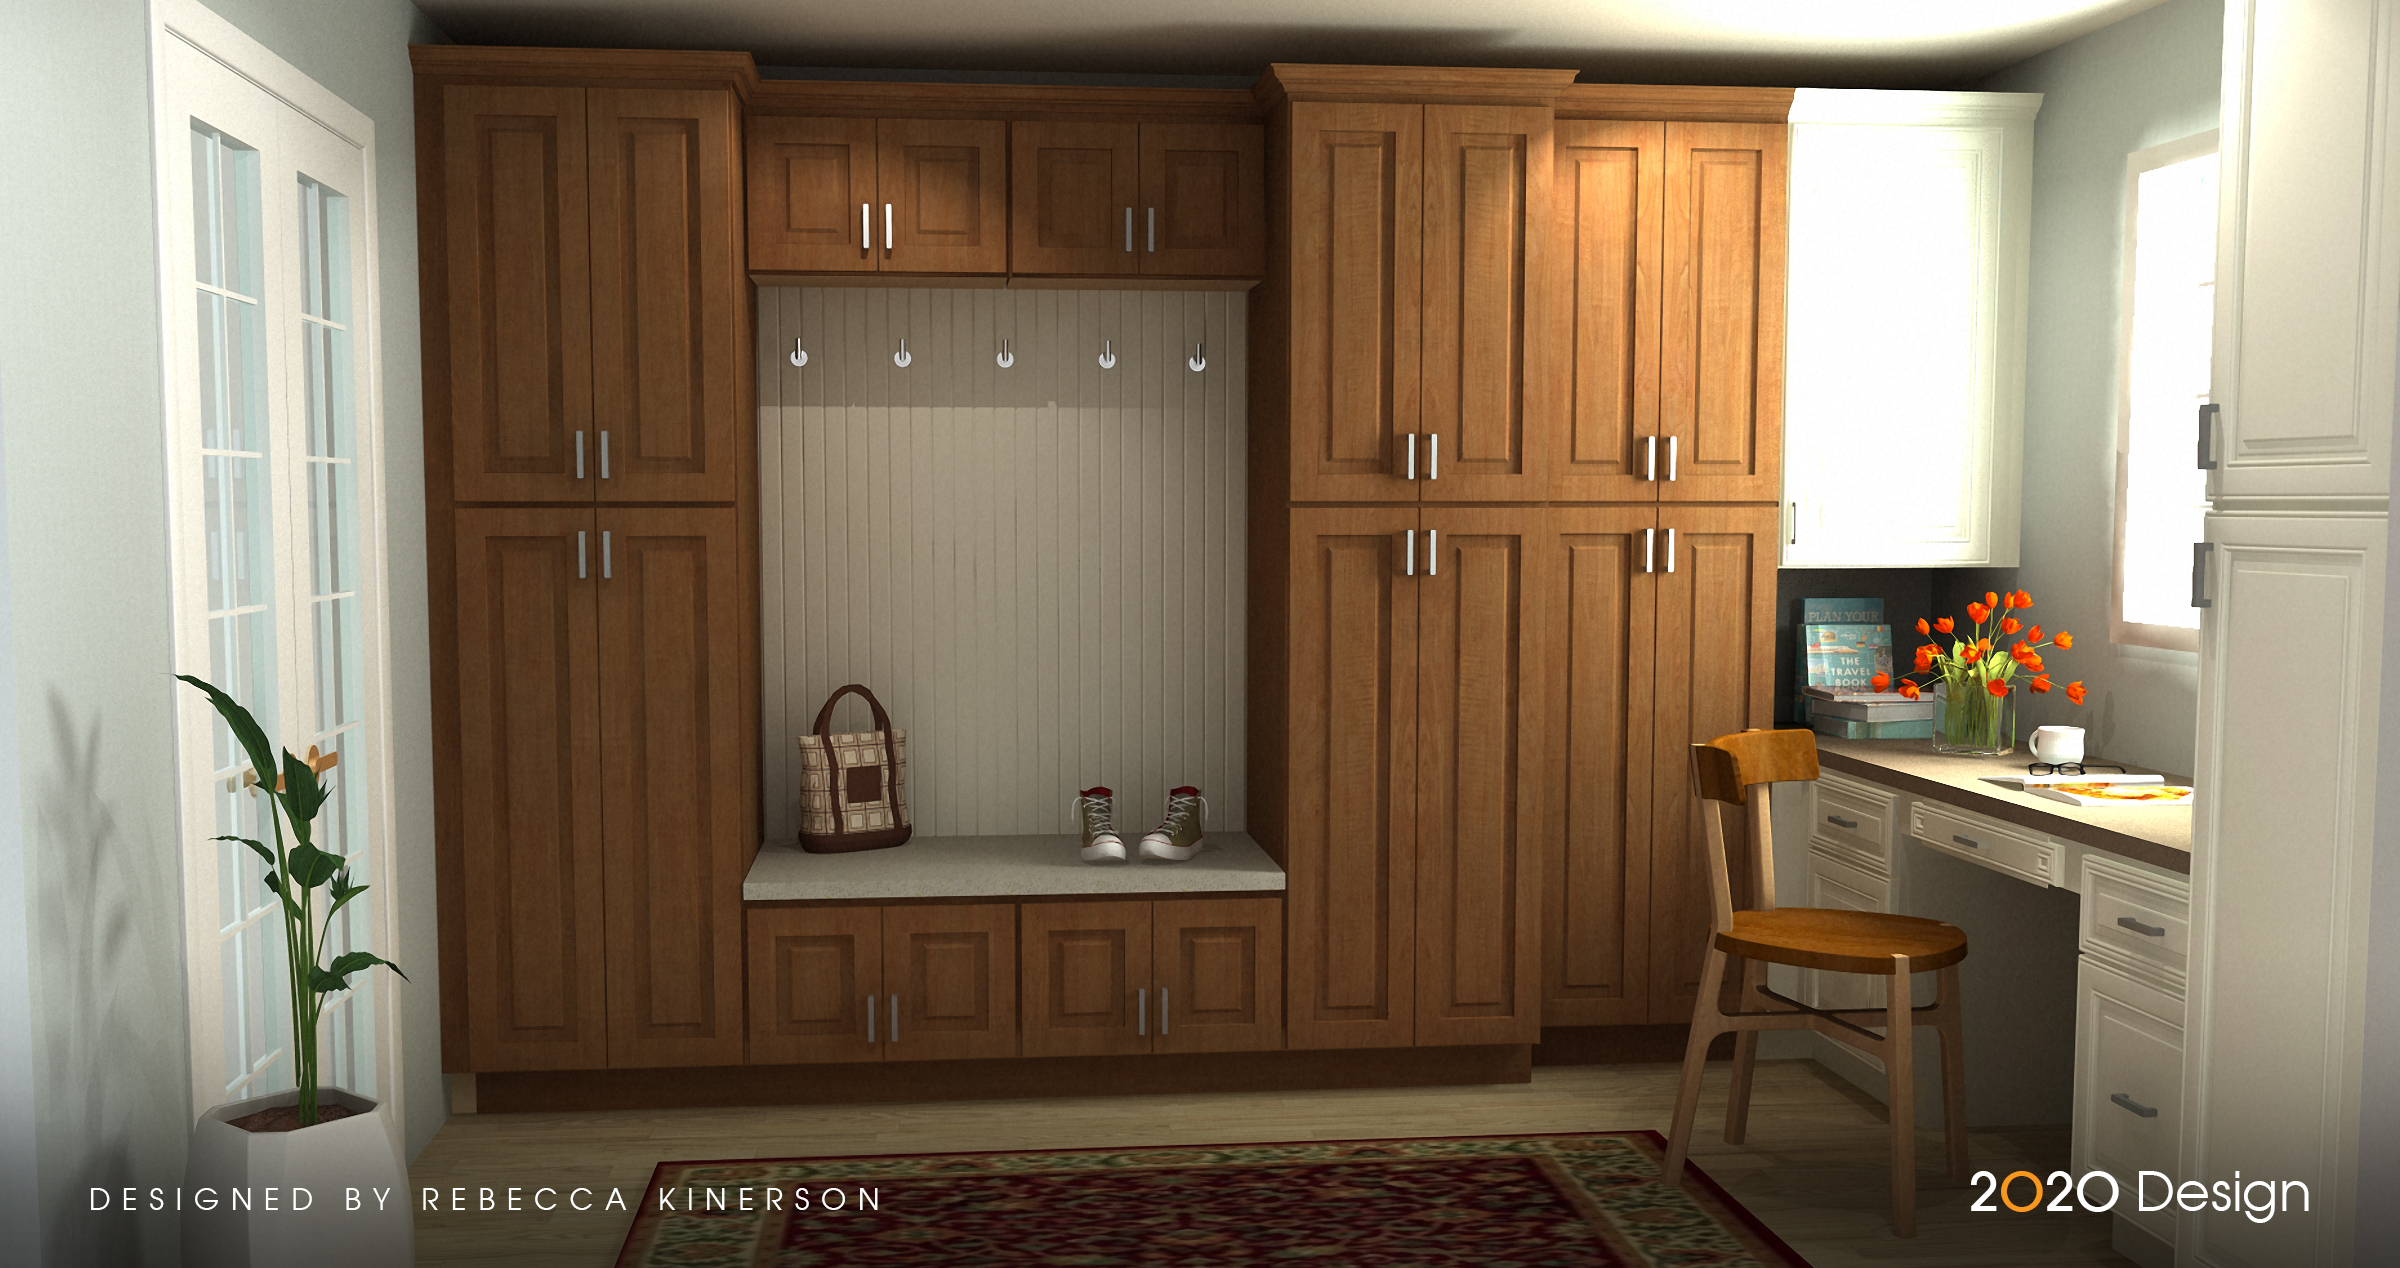 Beyond The Closet Designing Alternative Storage Solutions Woodworking Network